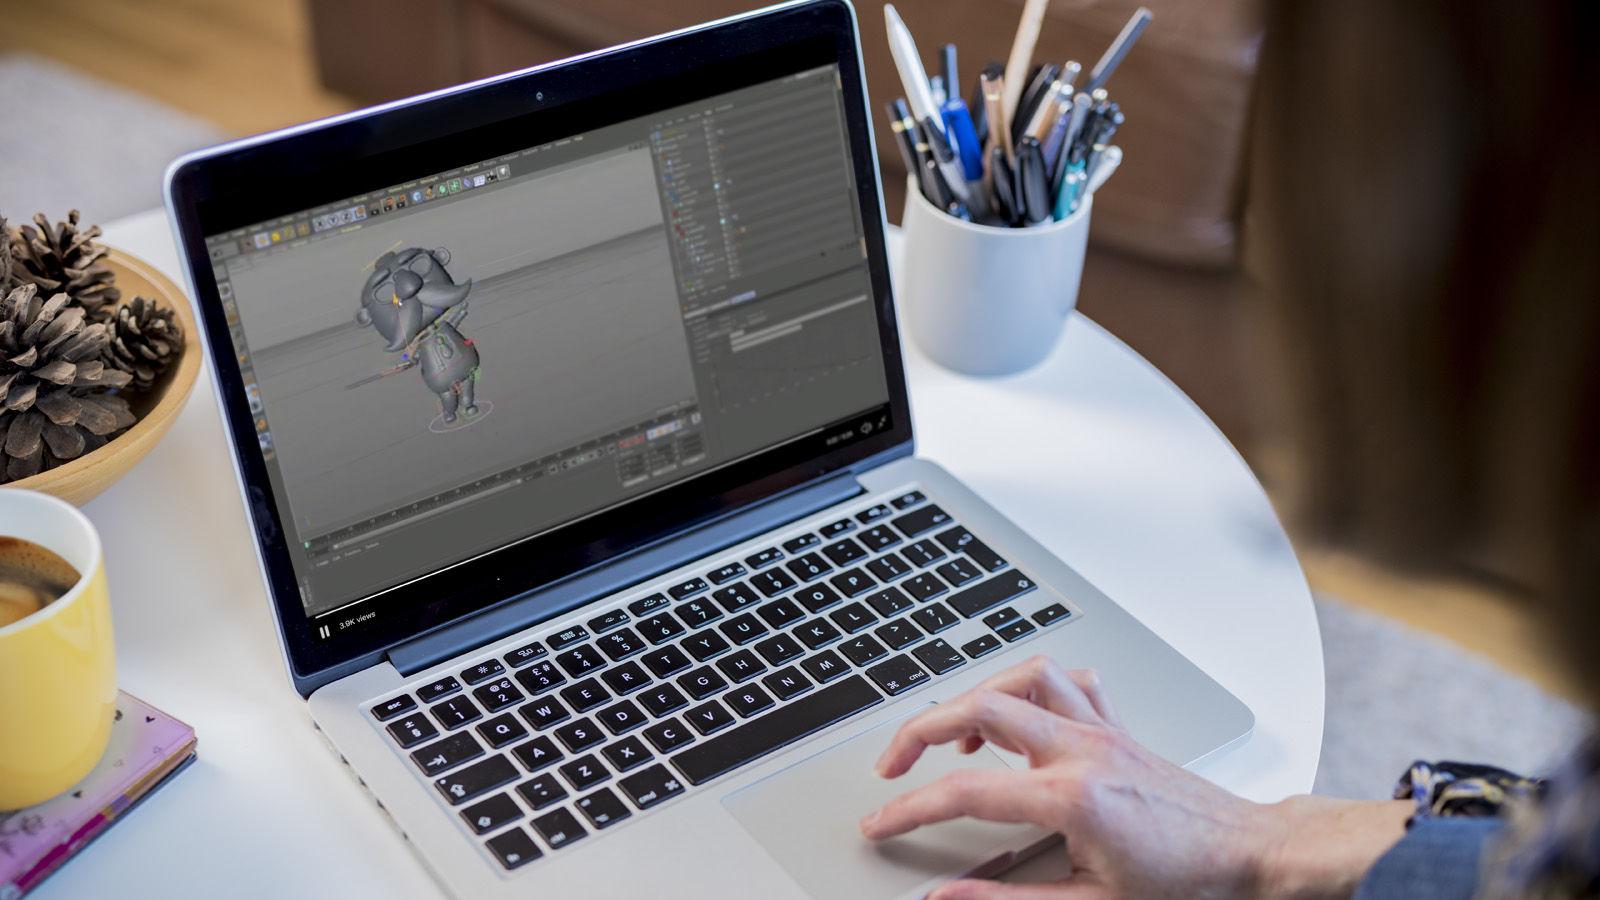 Best Laptop for Cartooning